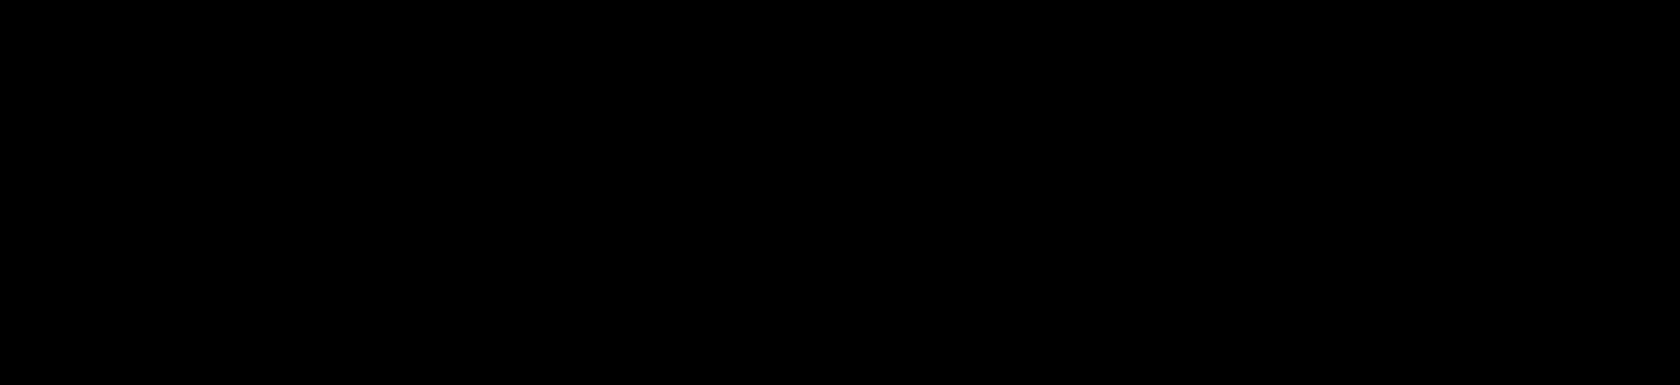 Patreon Dboi88